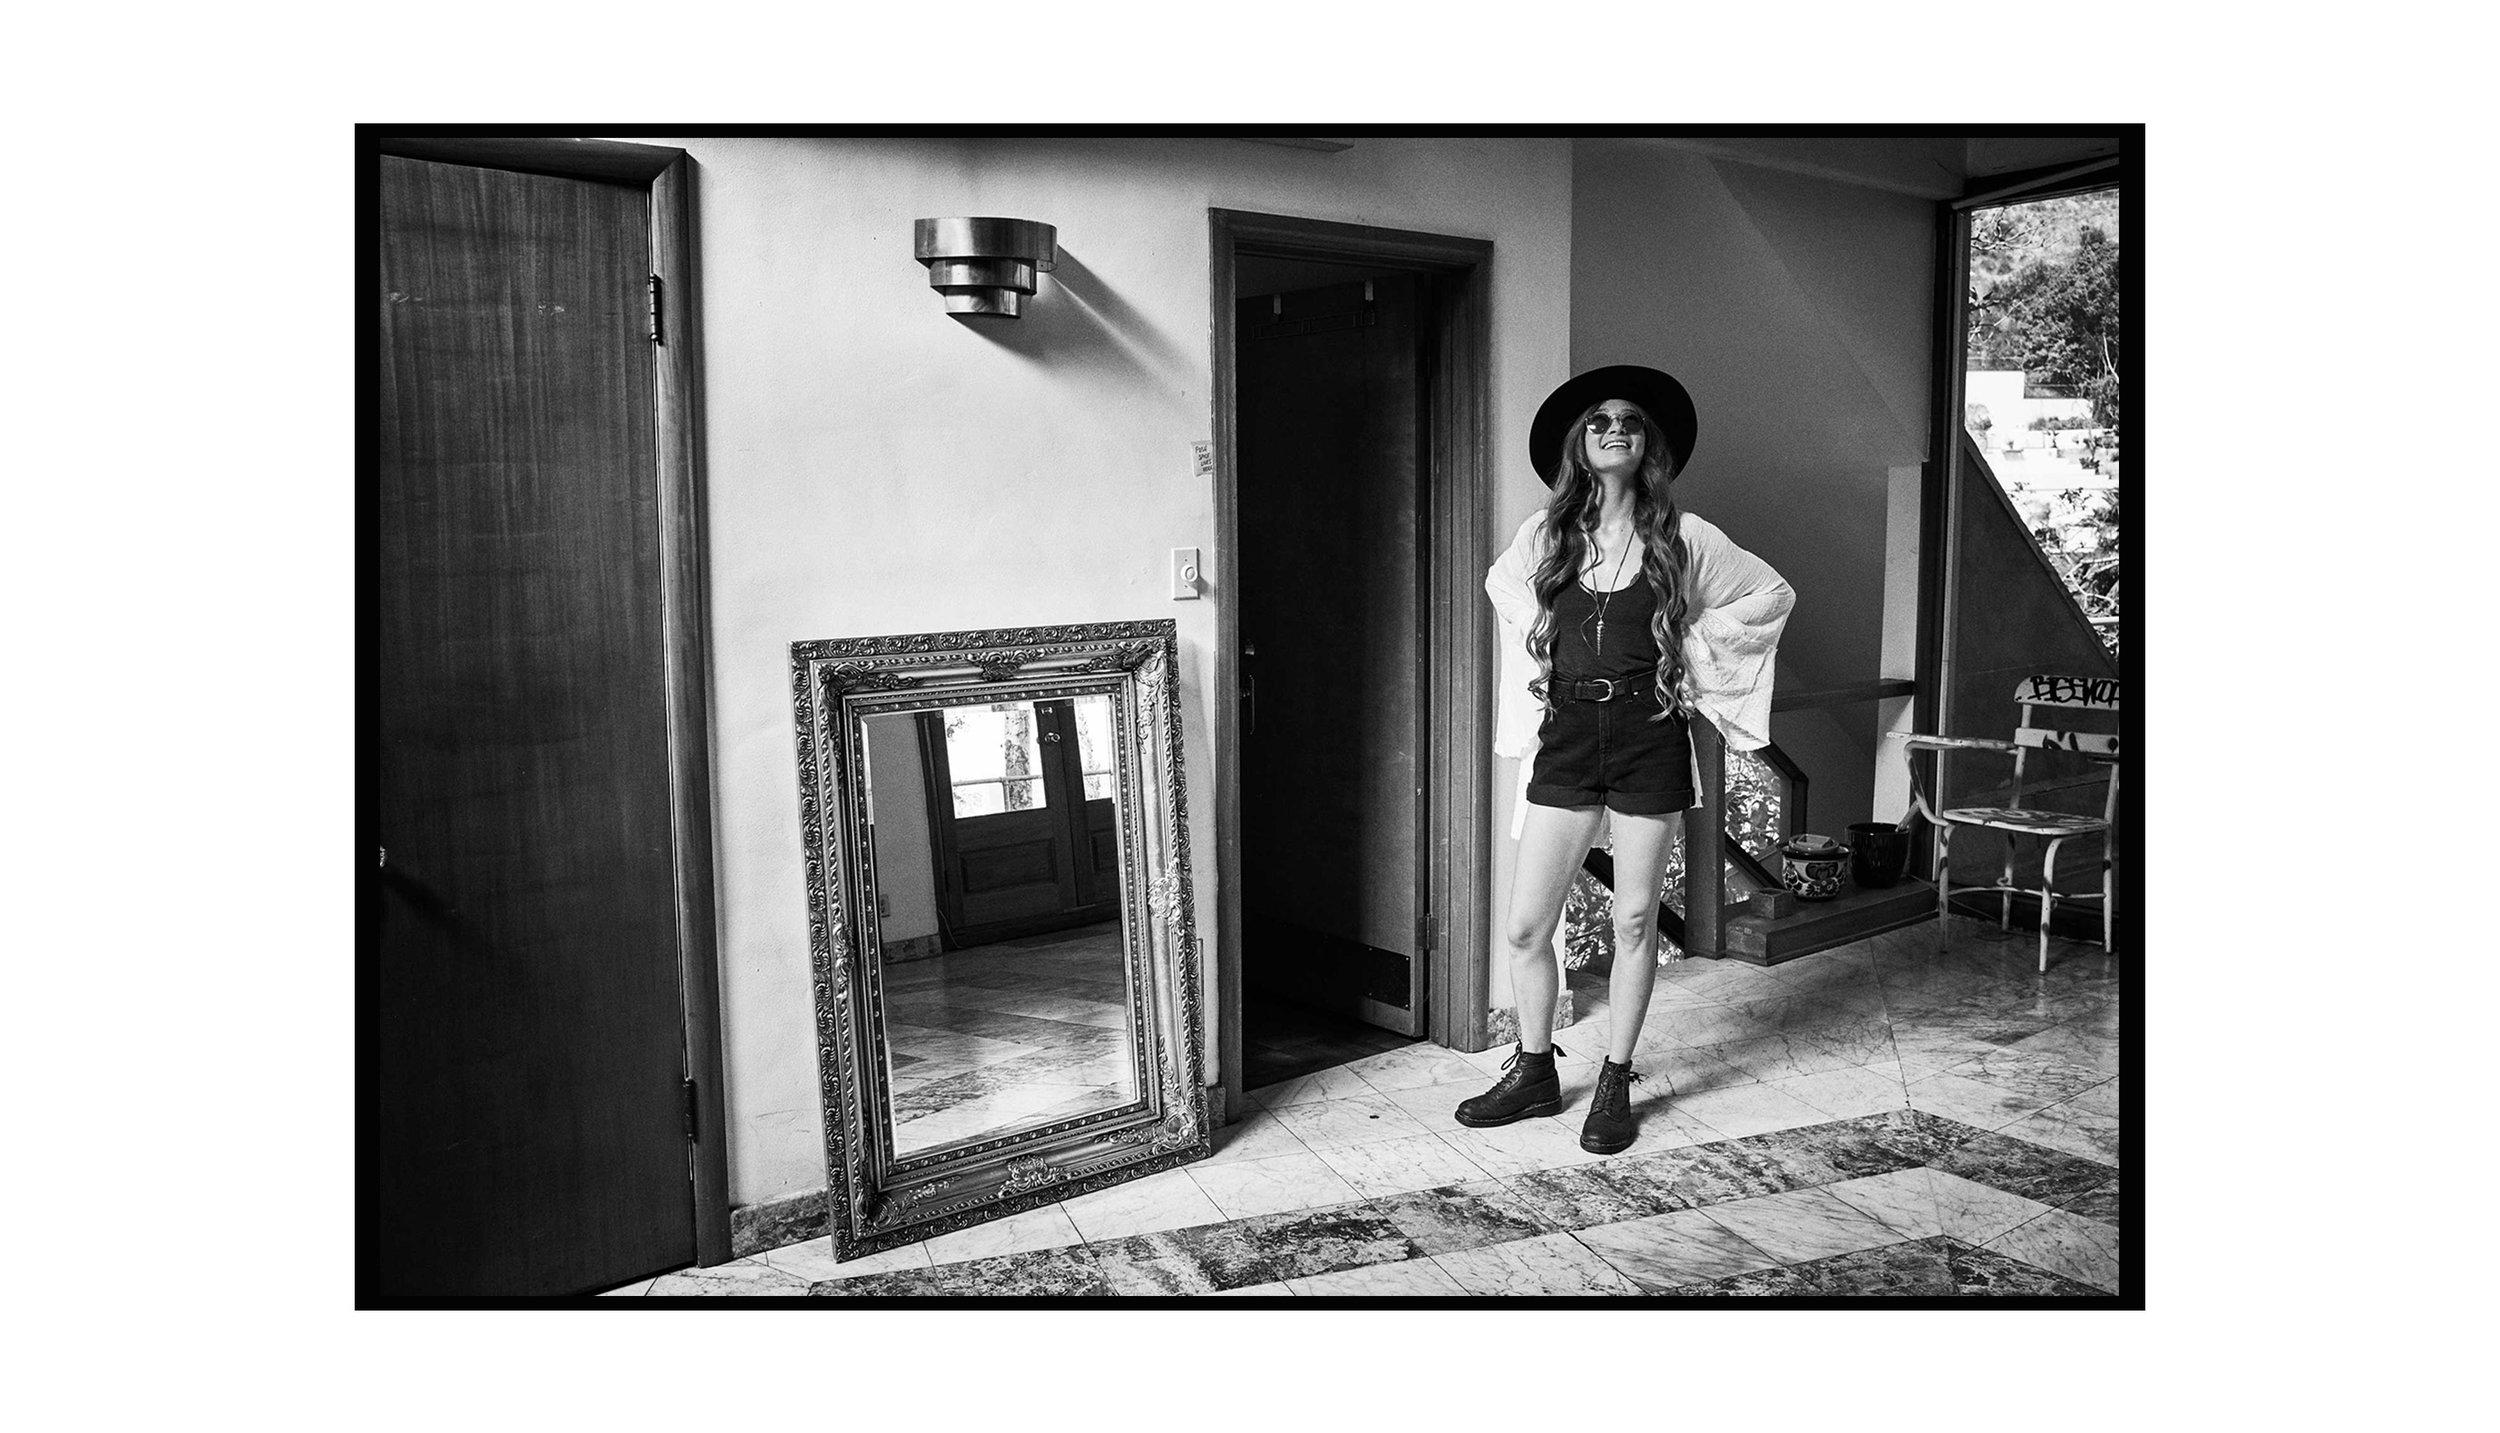 michael-scott-slosar-jade-la-street-stories-1.jpg